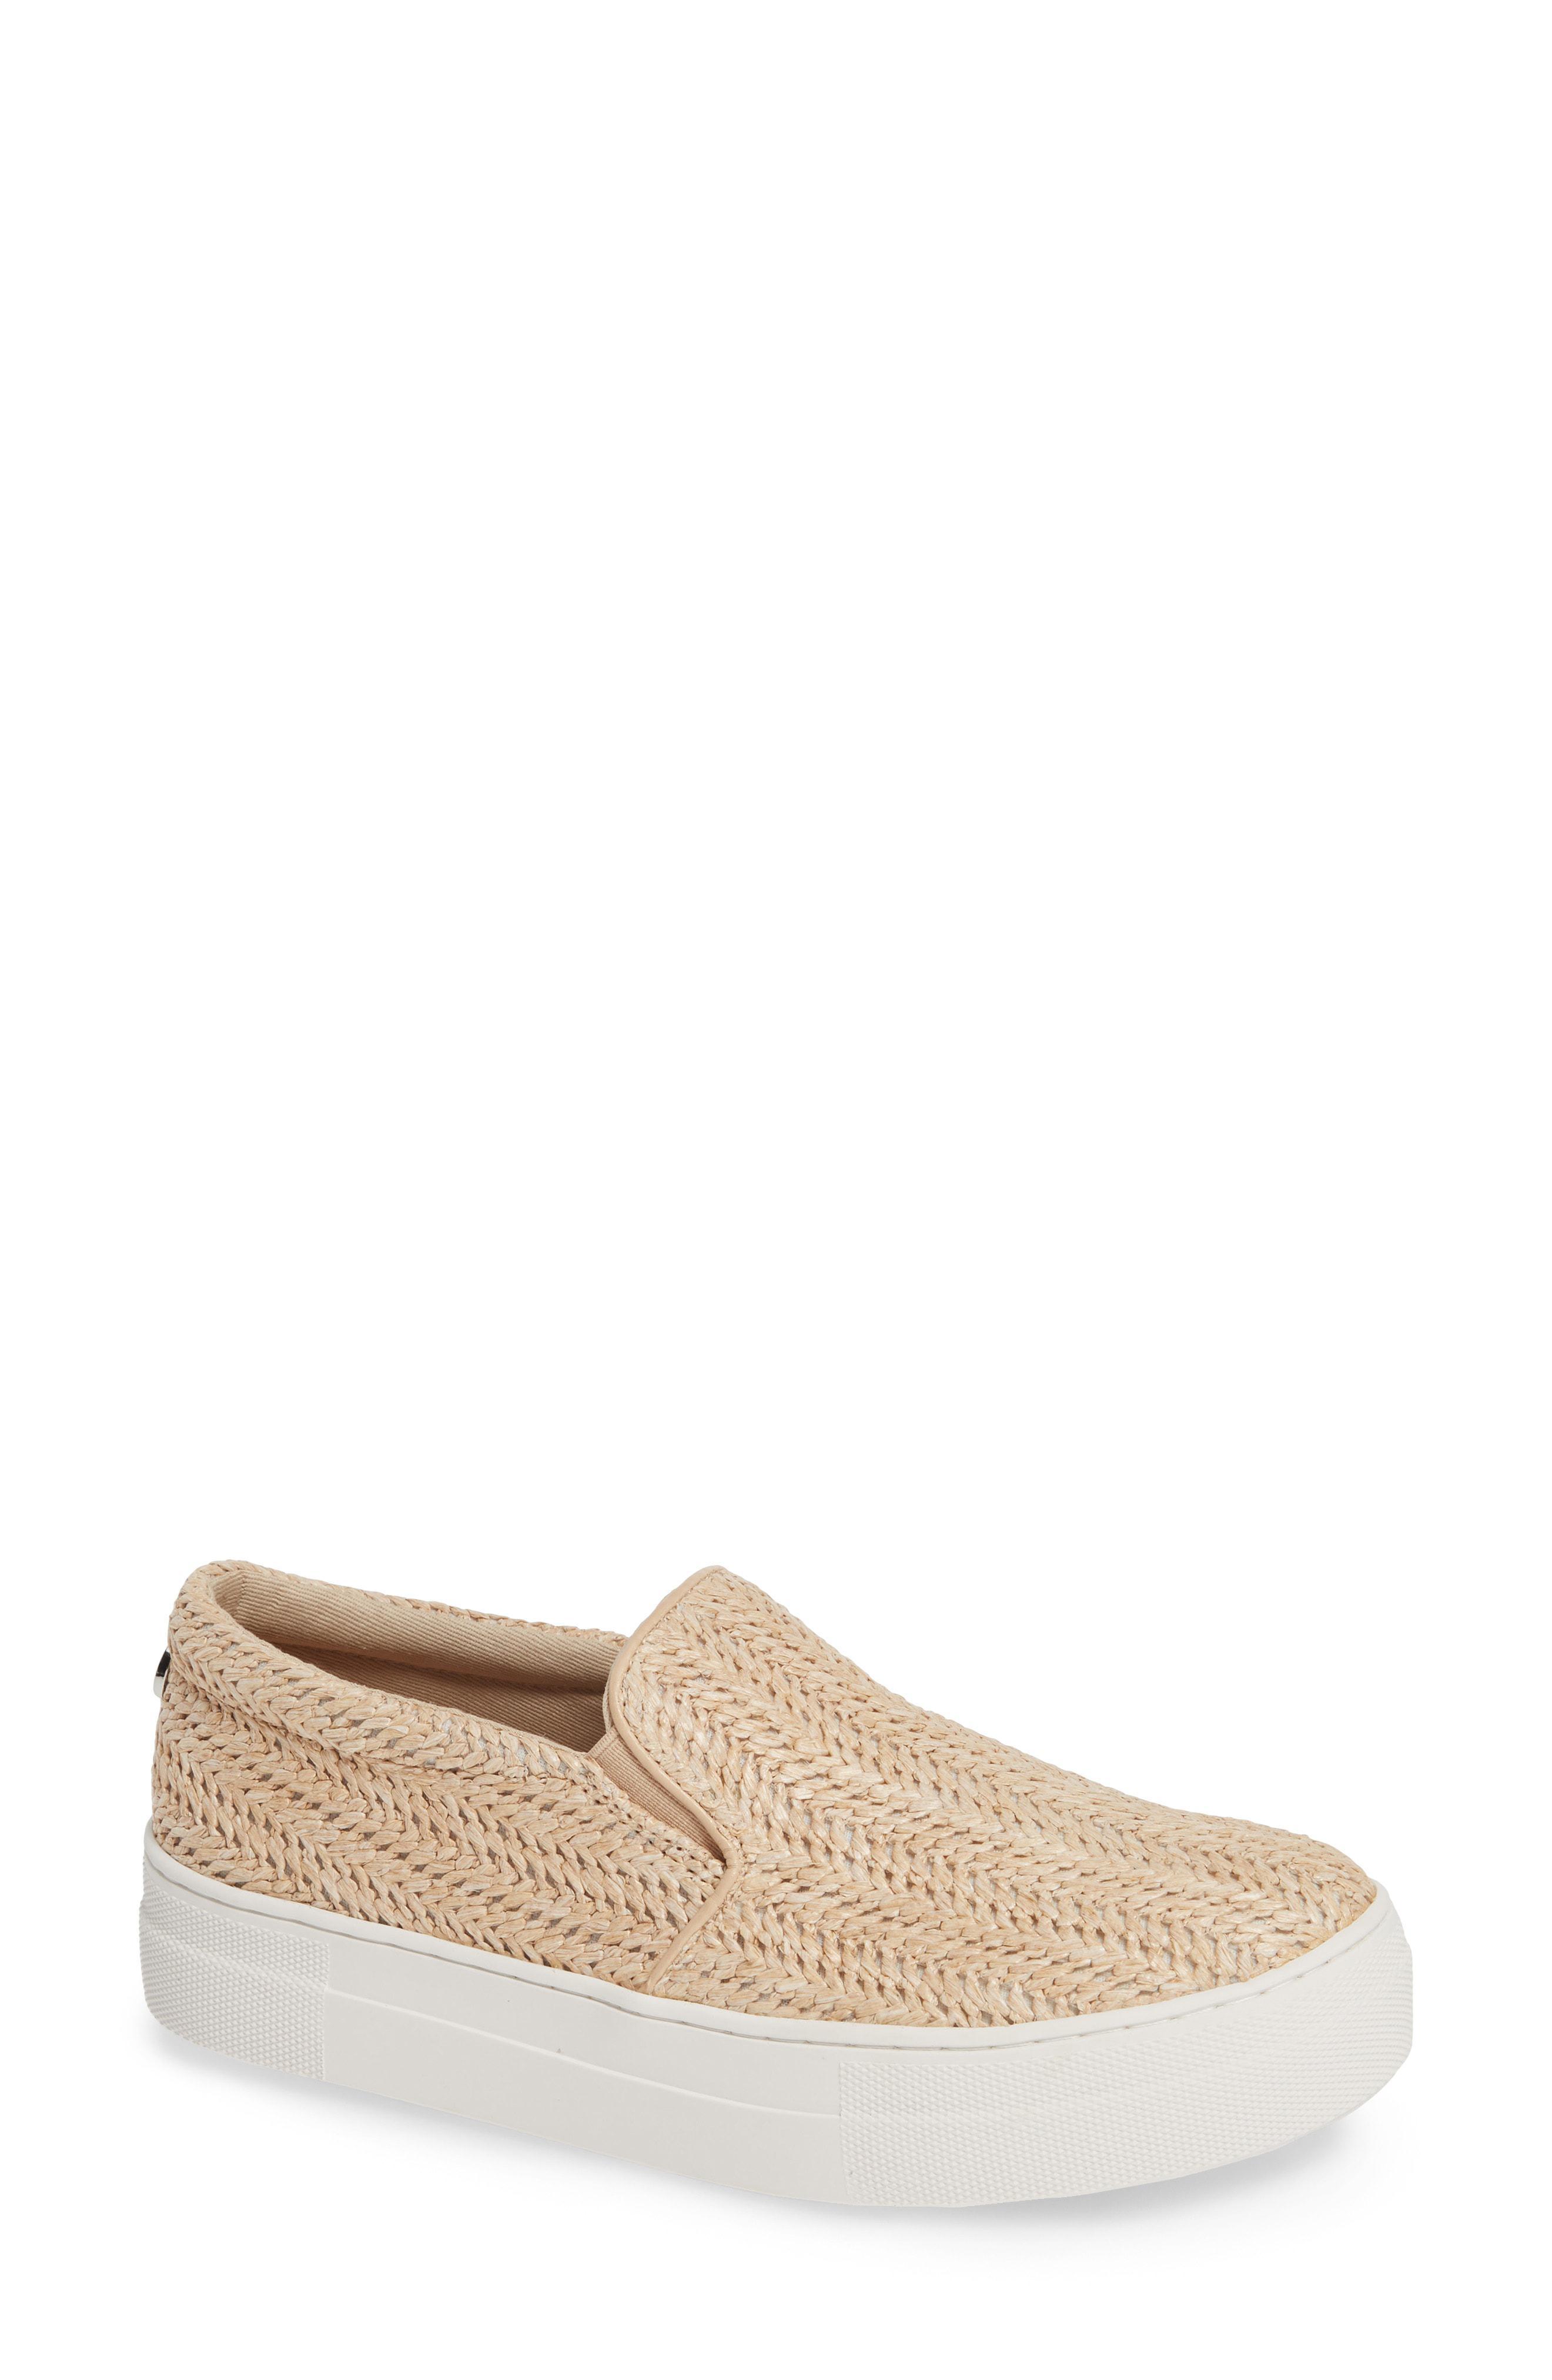 d4c789597d5 Lyst - Steve Madden Gills Platform Slip-on Sneaker in Natural